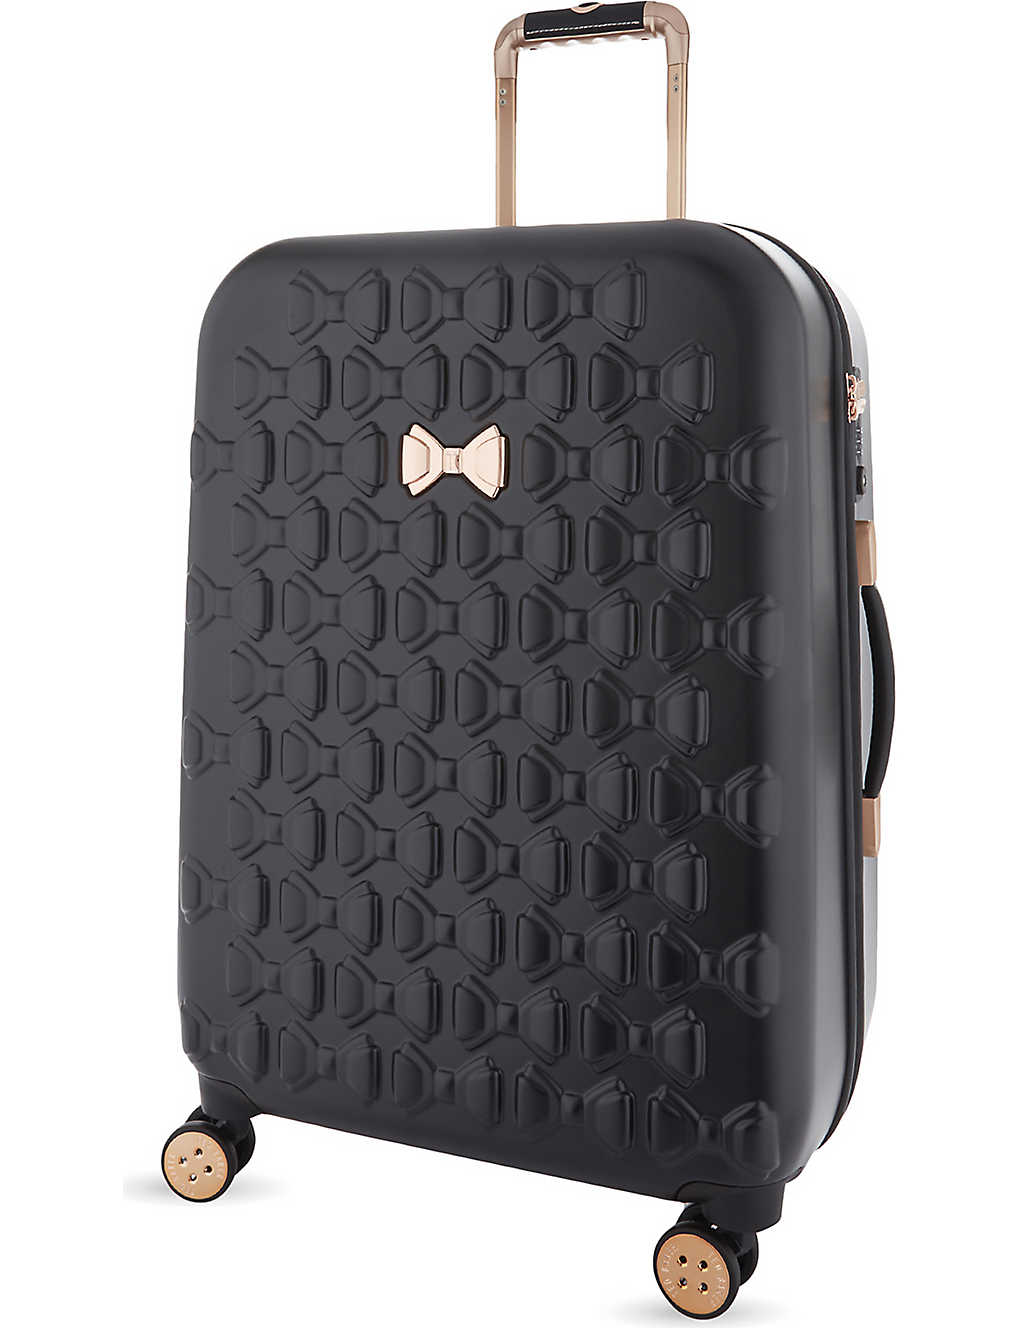 519c715a1 TED BAKER - Beau medium four-wheel suitcase 68cm